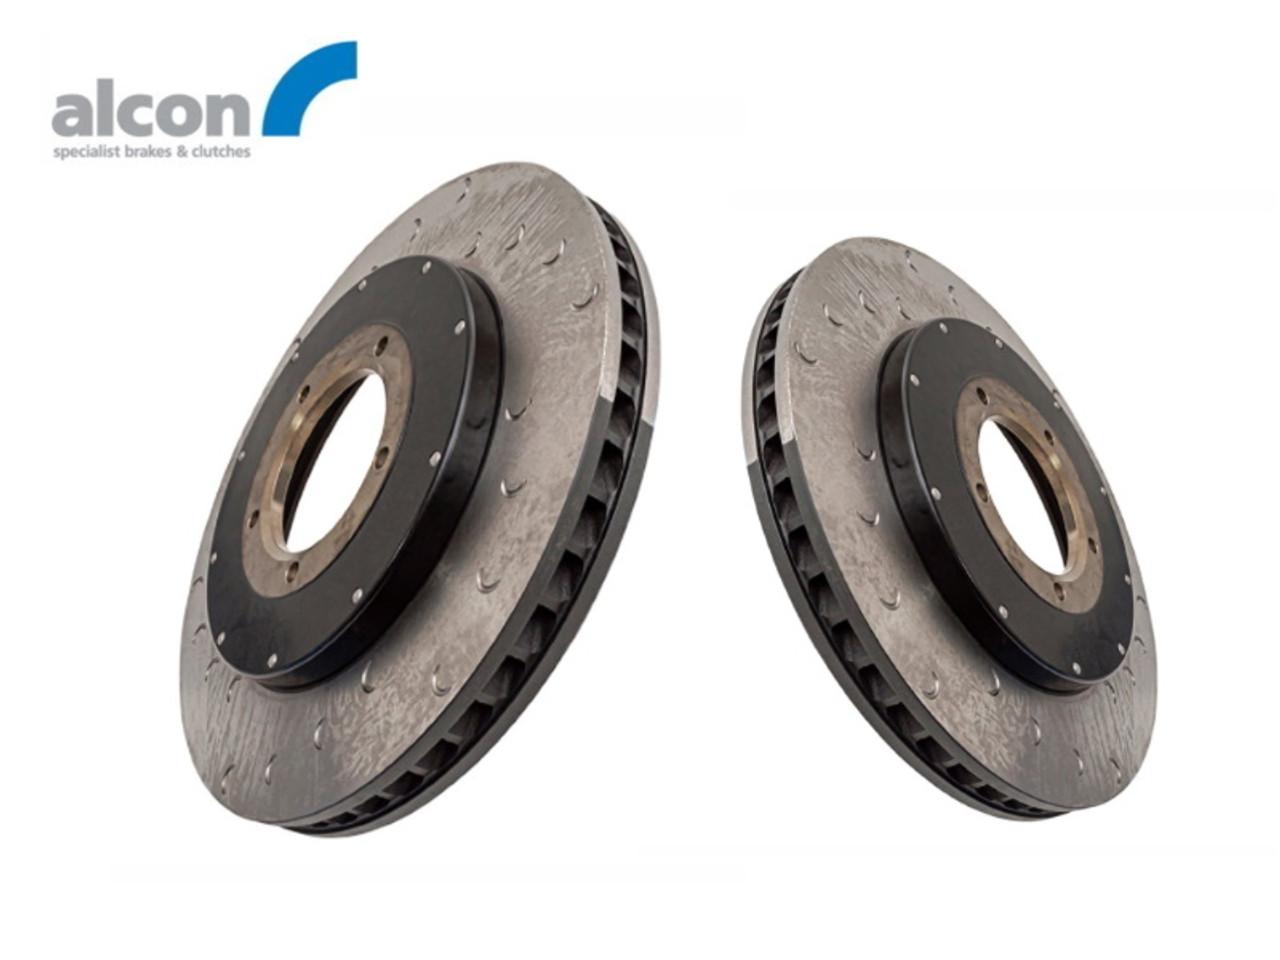 Alcon Defender 18 Inch Front Brake Kit Replacement Disc Set - DA2709/10